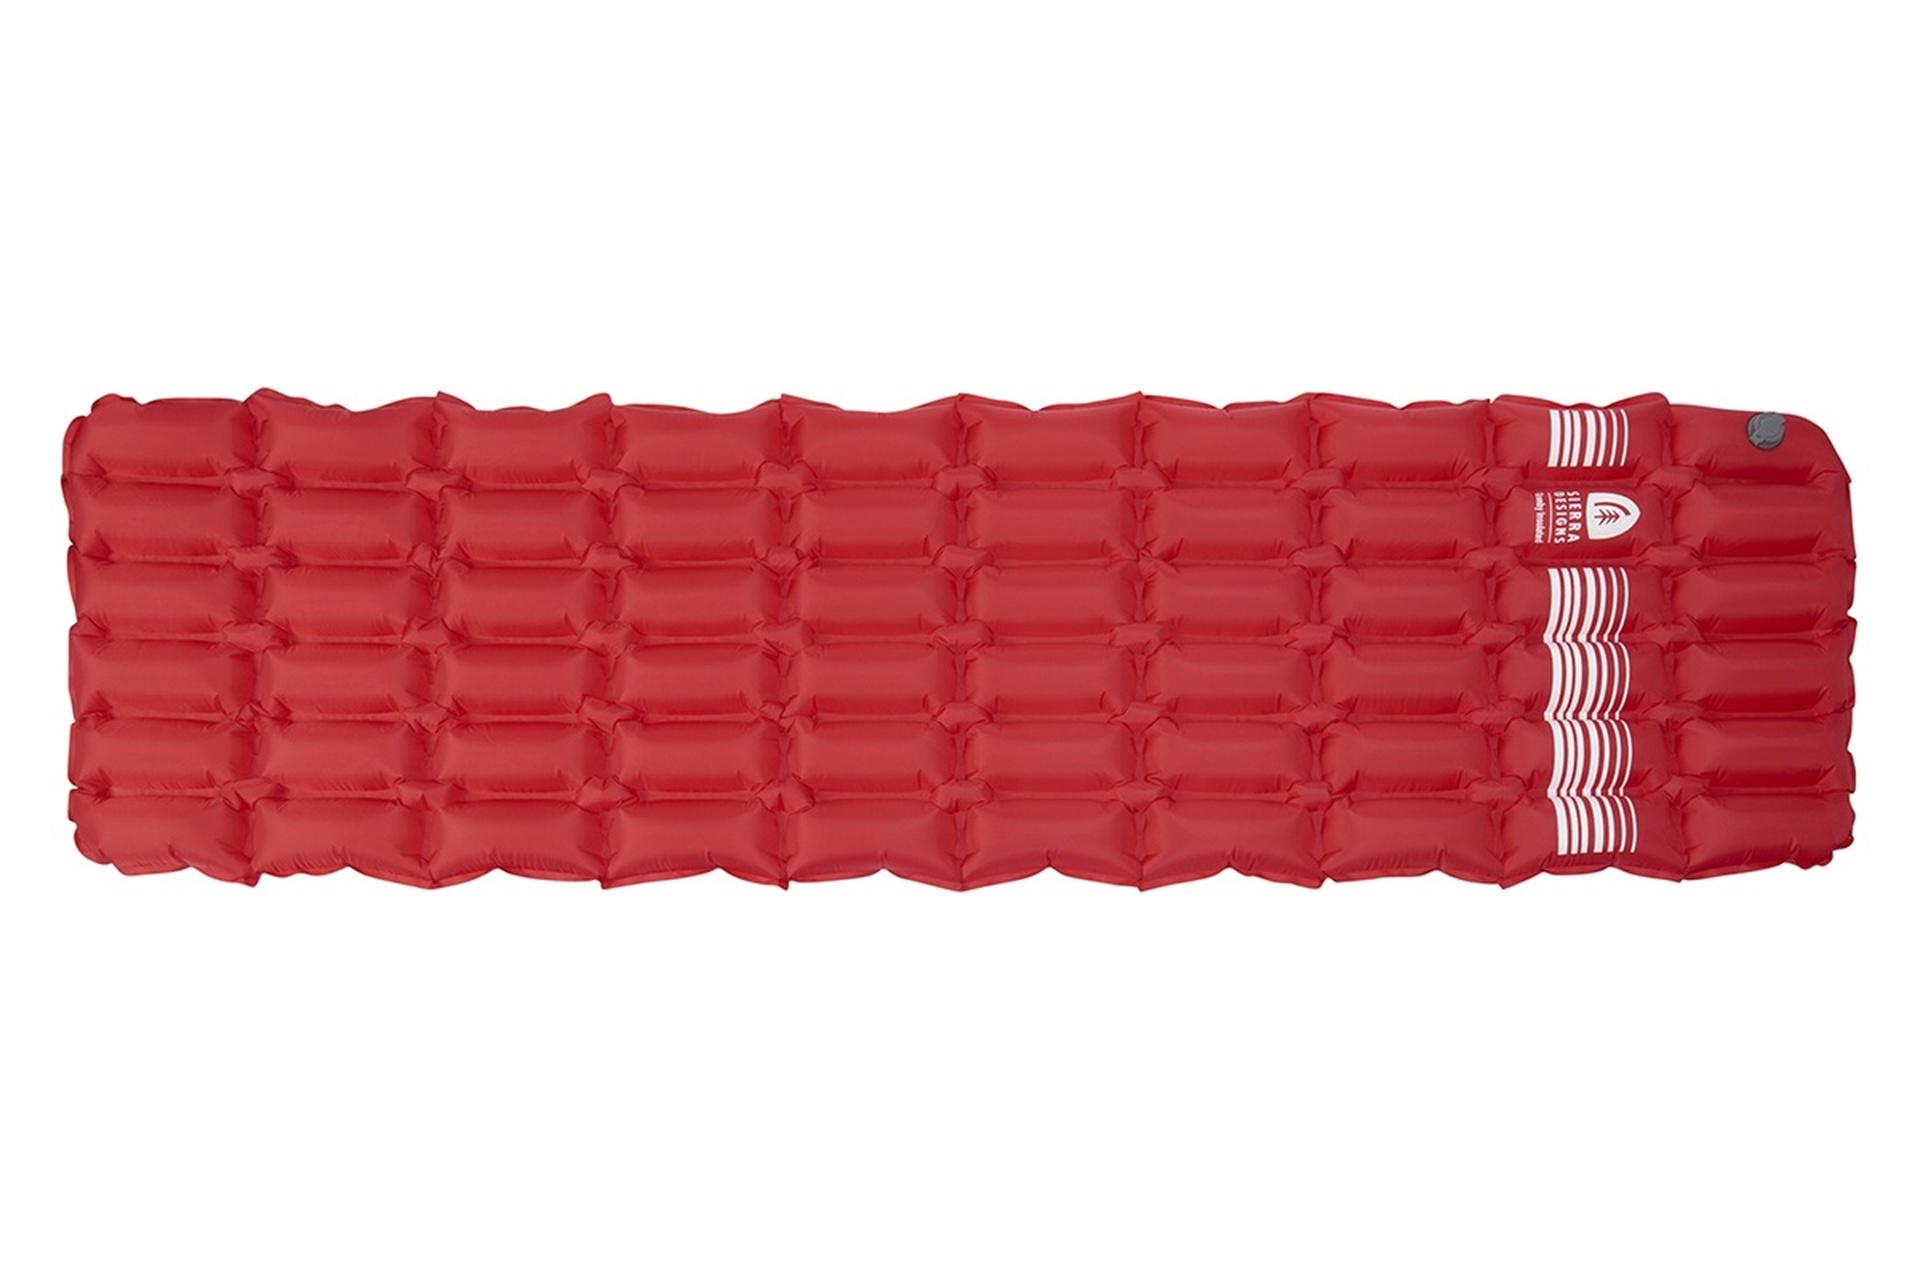 Sierra Designs Granby Insulated Sleeping Pad